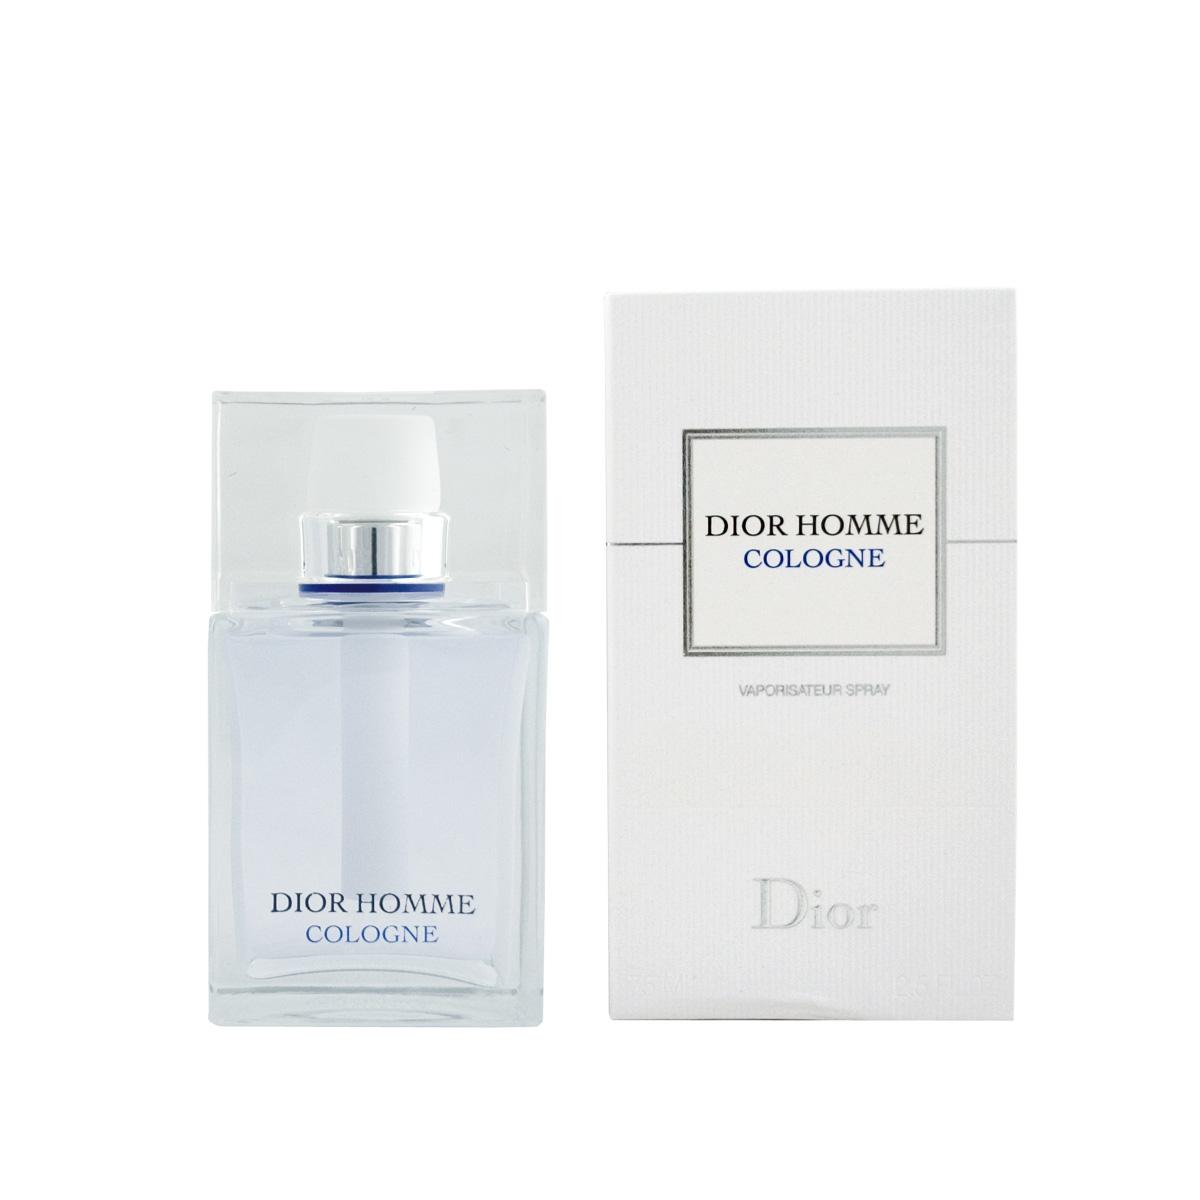 Dior Christian Homme Cologne 2013 EDC 75 ml M